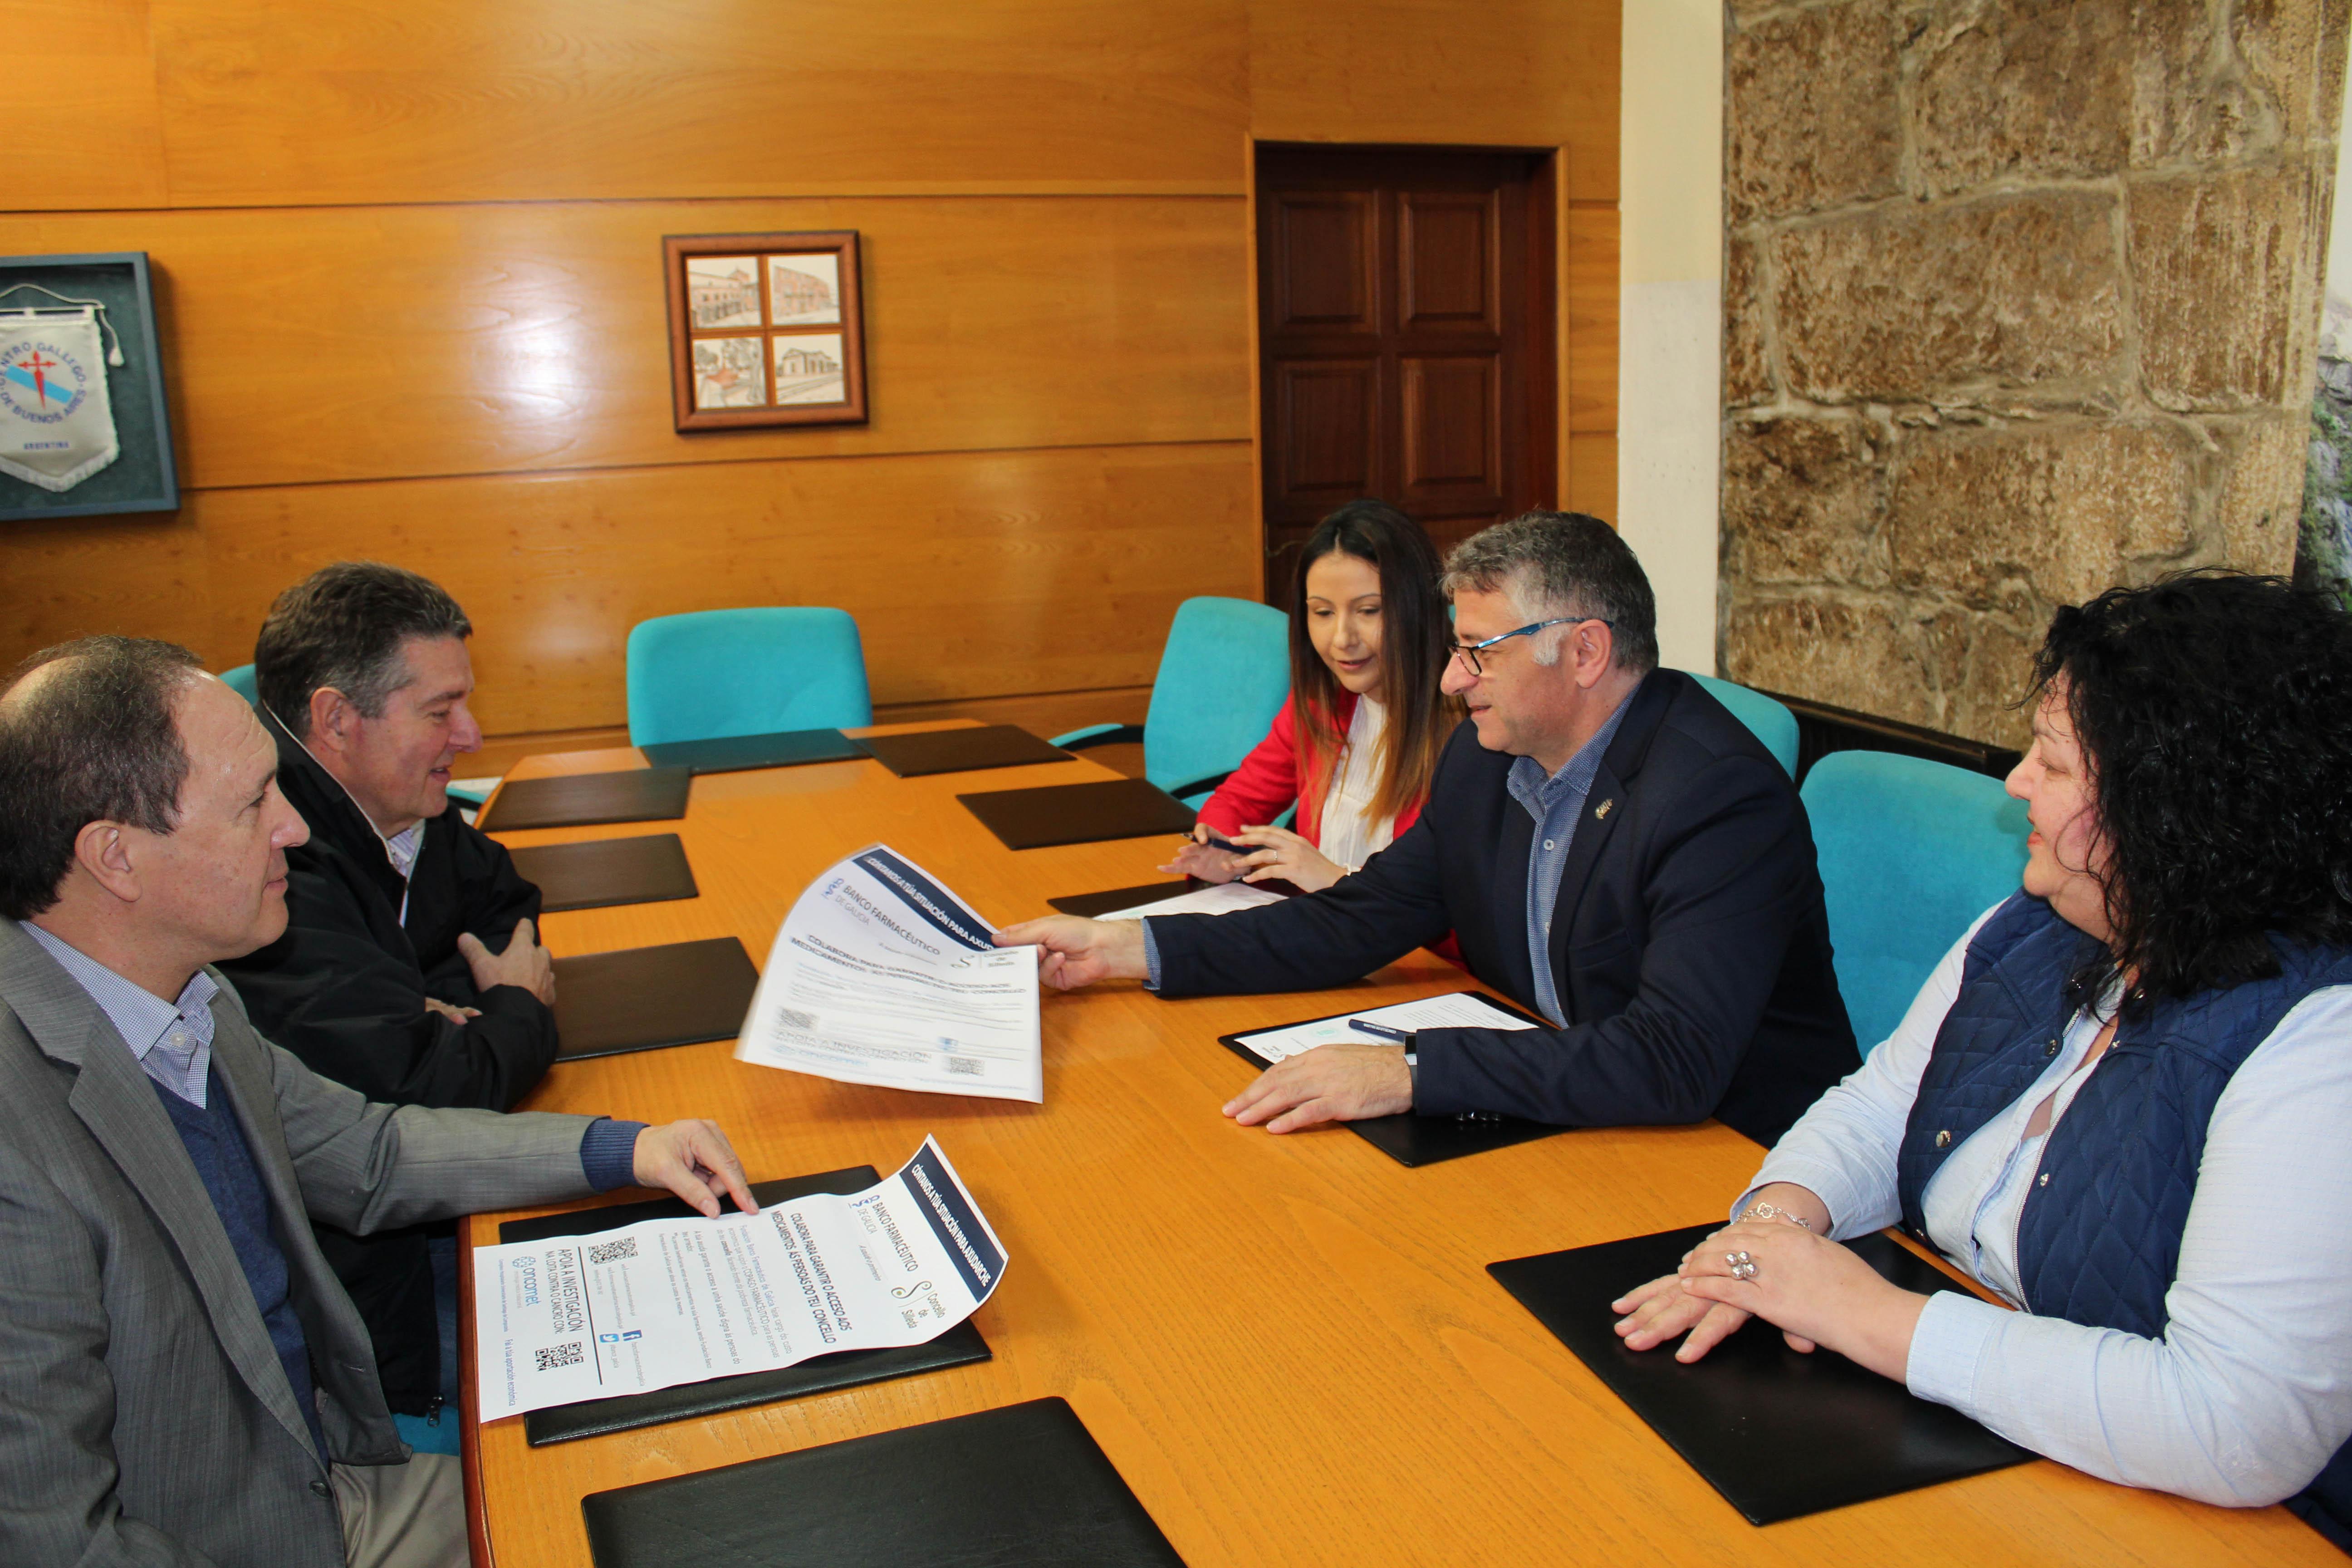 O Concello de Silleda, pioneiro en colaborar ca Fundación Banco Farmacéutico de Galicia